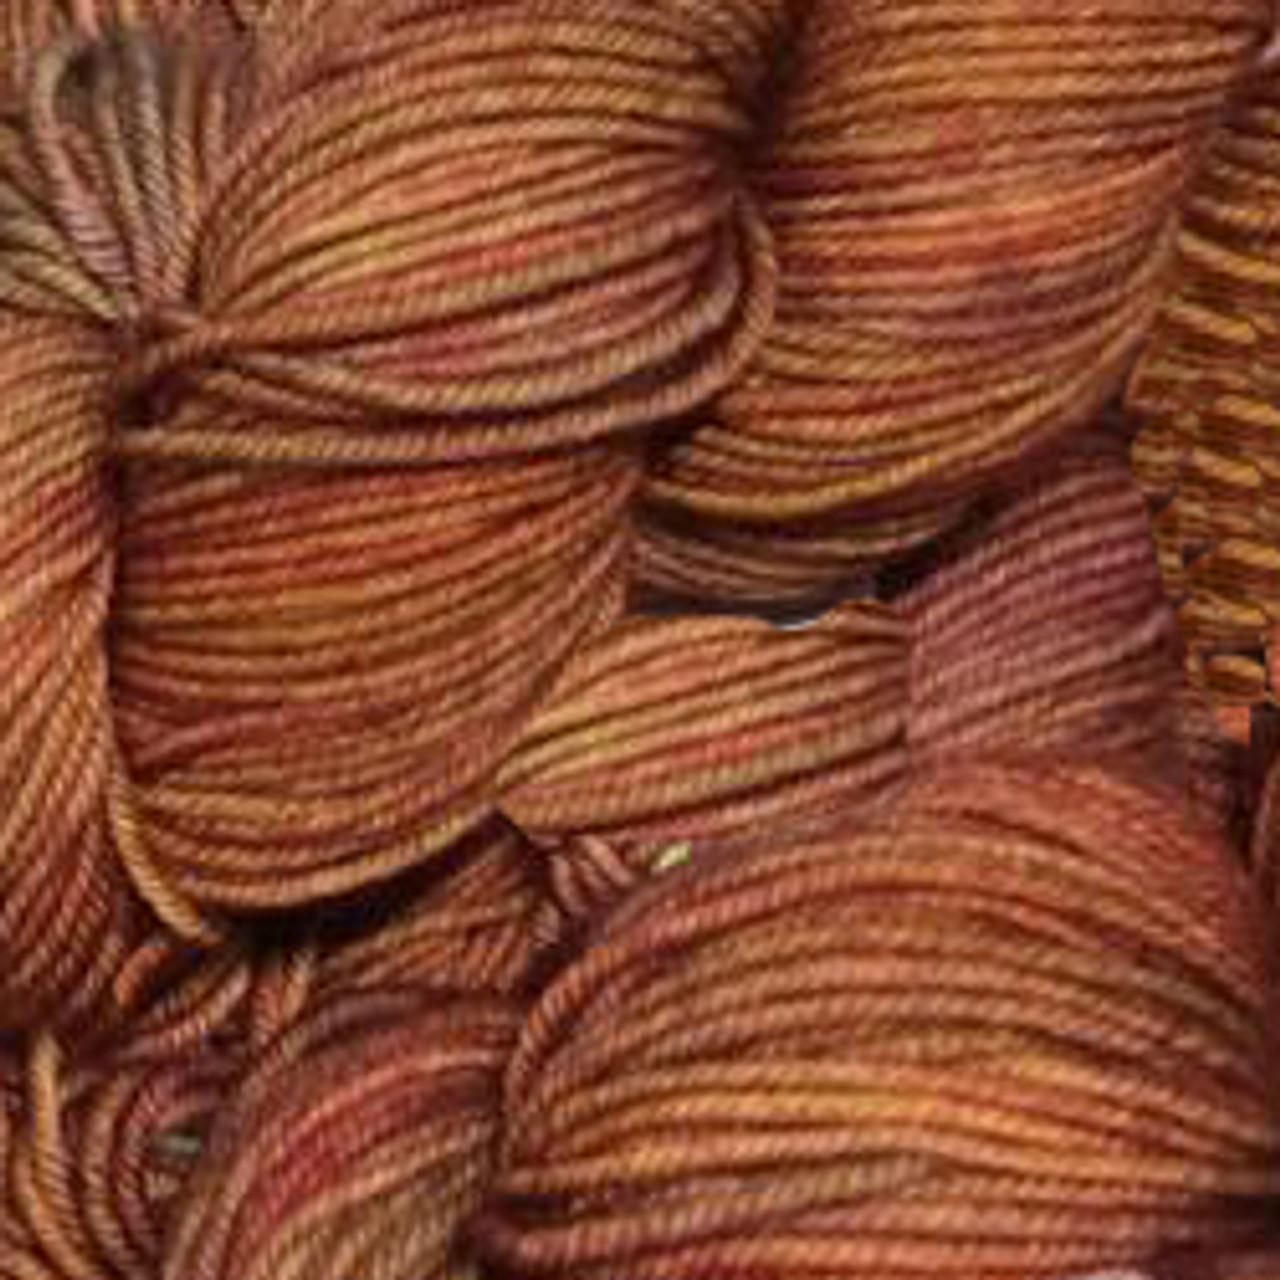 Madelinetosh Yarn - Tosh Vintage - Worsted Weight Wool